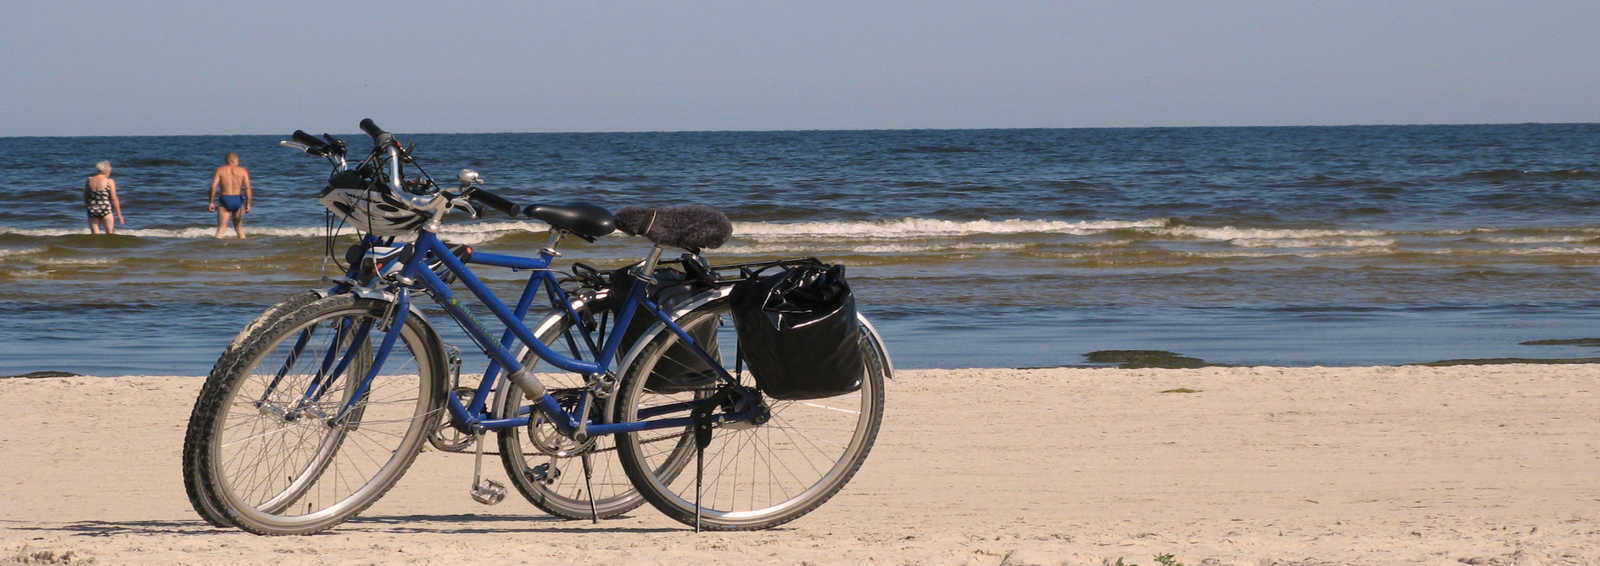 Bikes on the Baltic coast